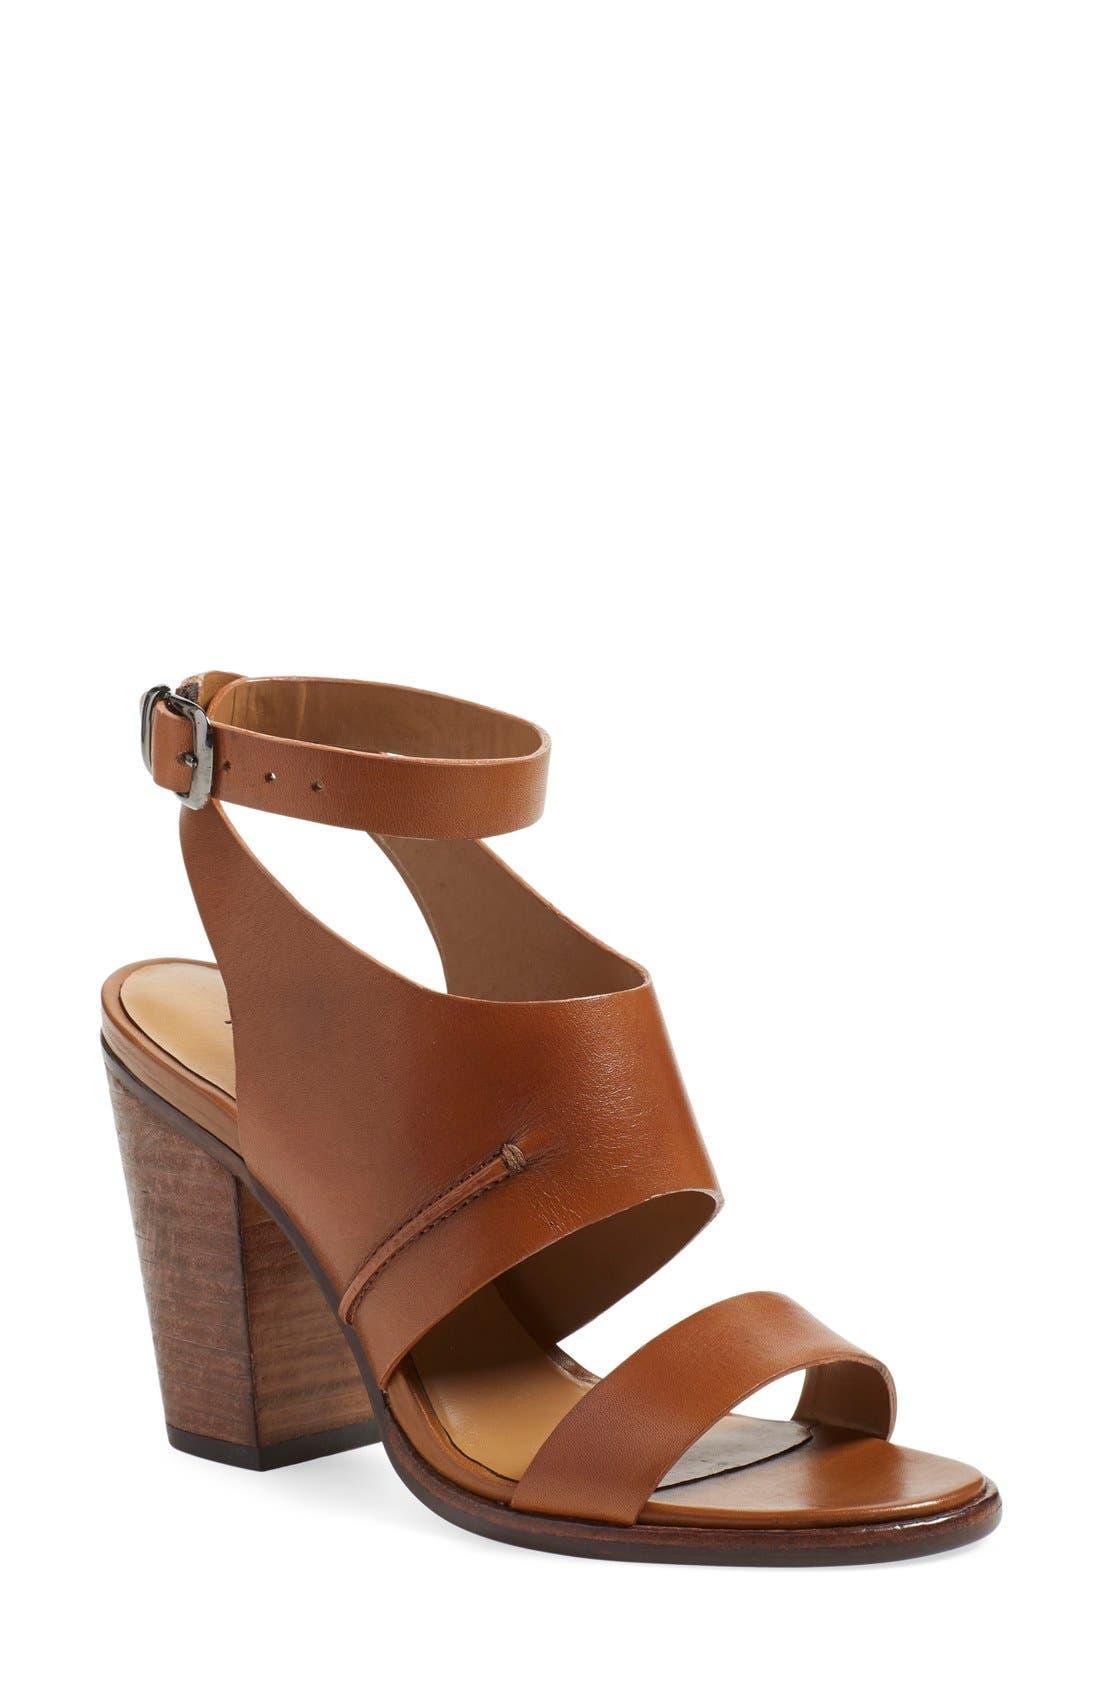 Main Image - Treasure&Bond 'Kaden' Ankle Strap Sandal (Women)